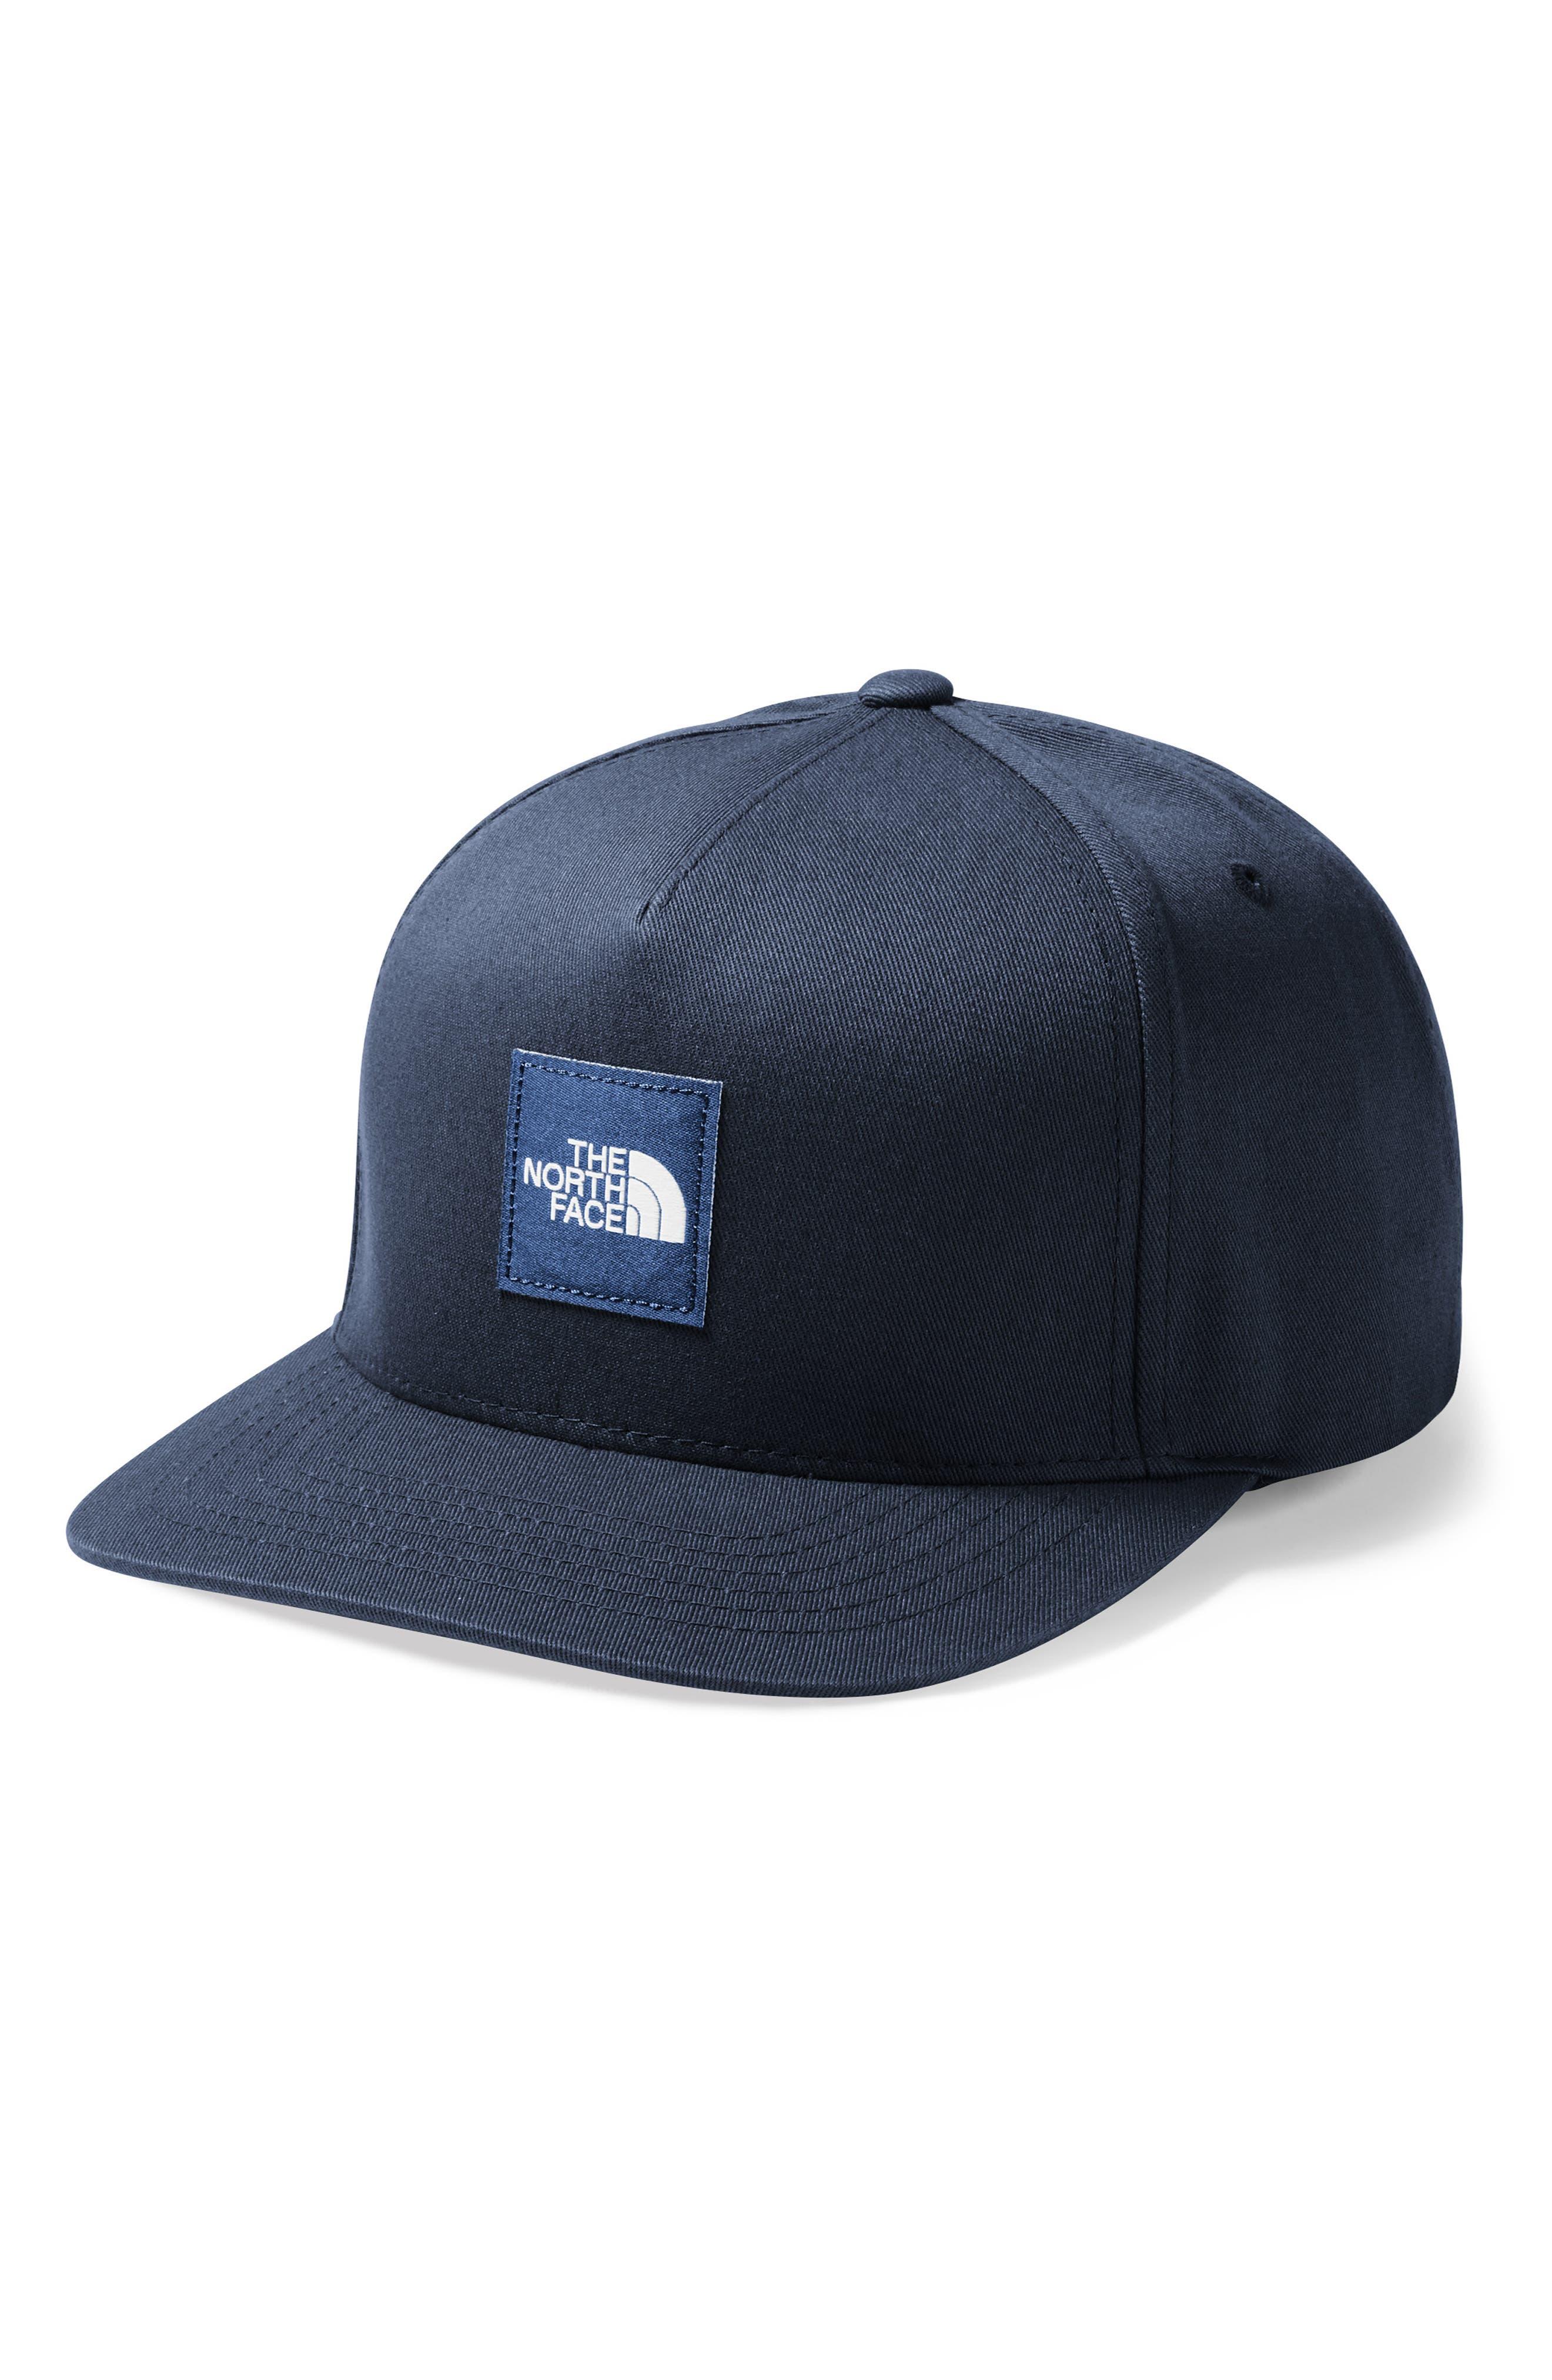 Street Baseball Cap,                             Main thumbnail 1, color,                             URBAN NAVY/ SHADY BLUE